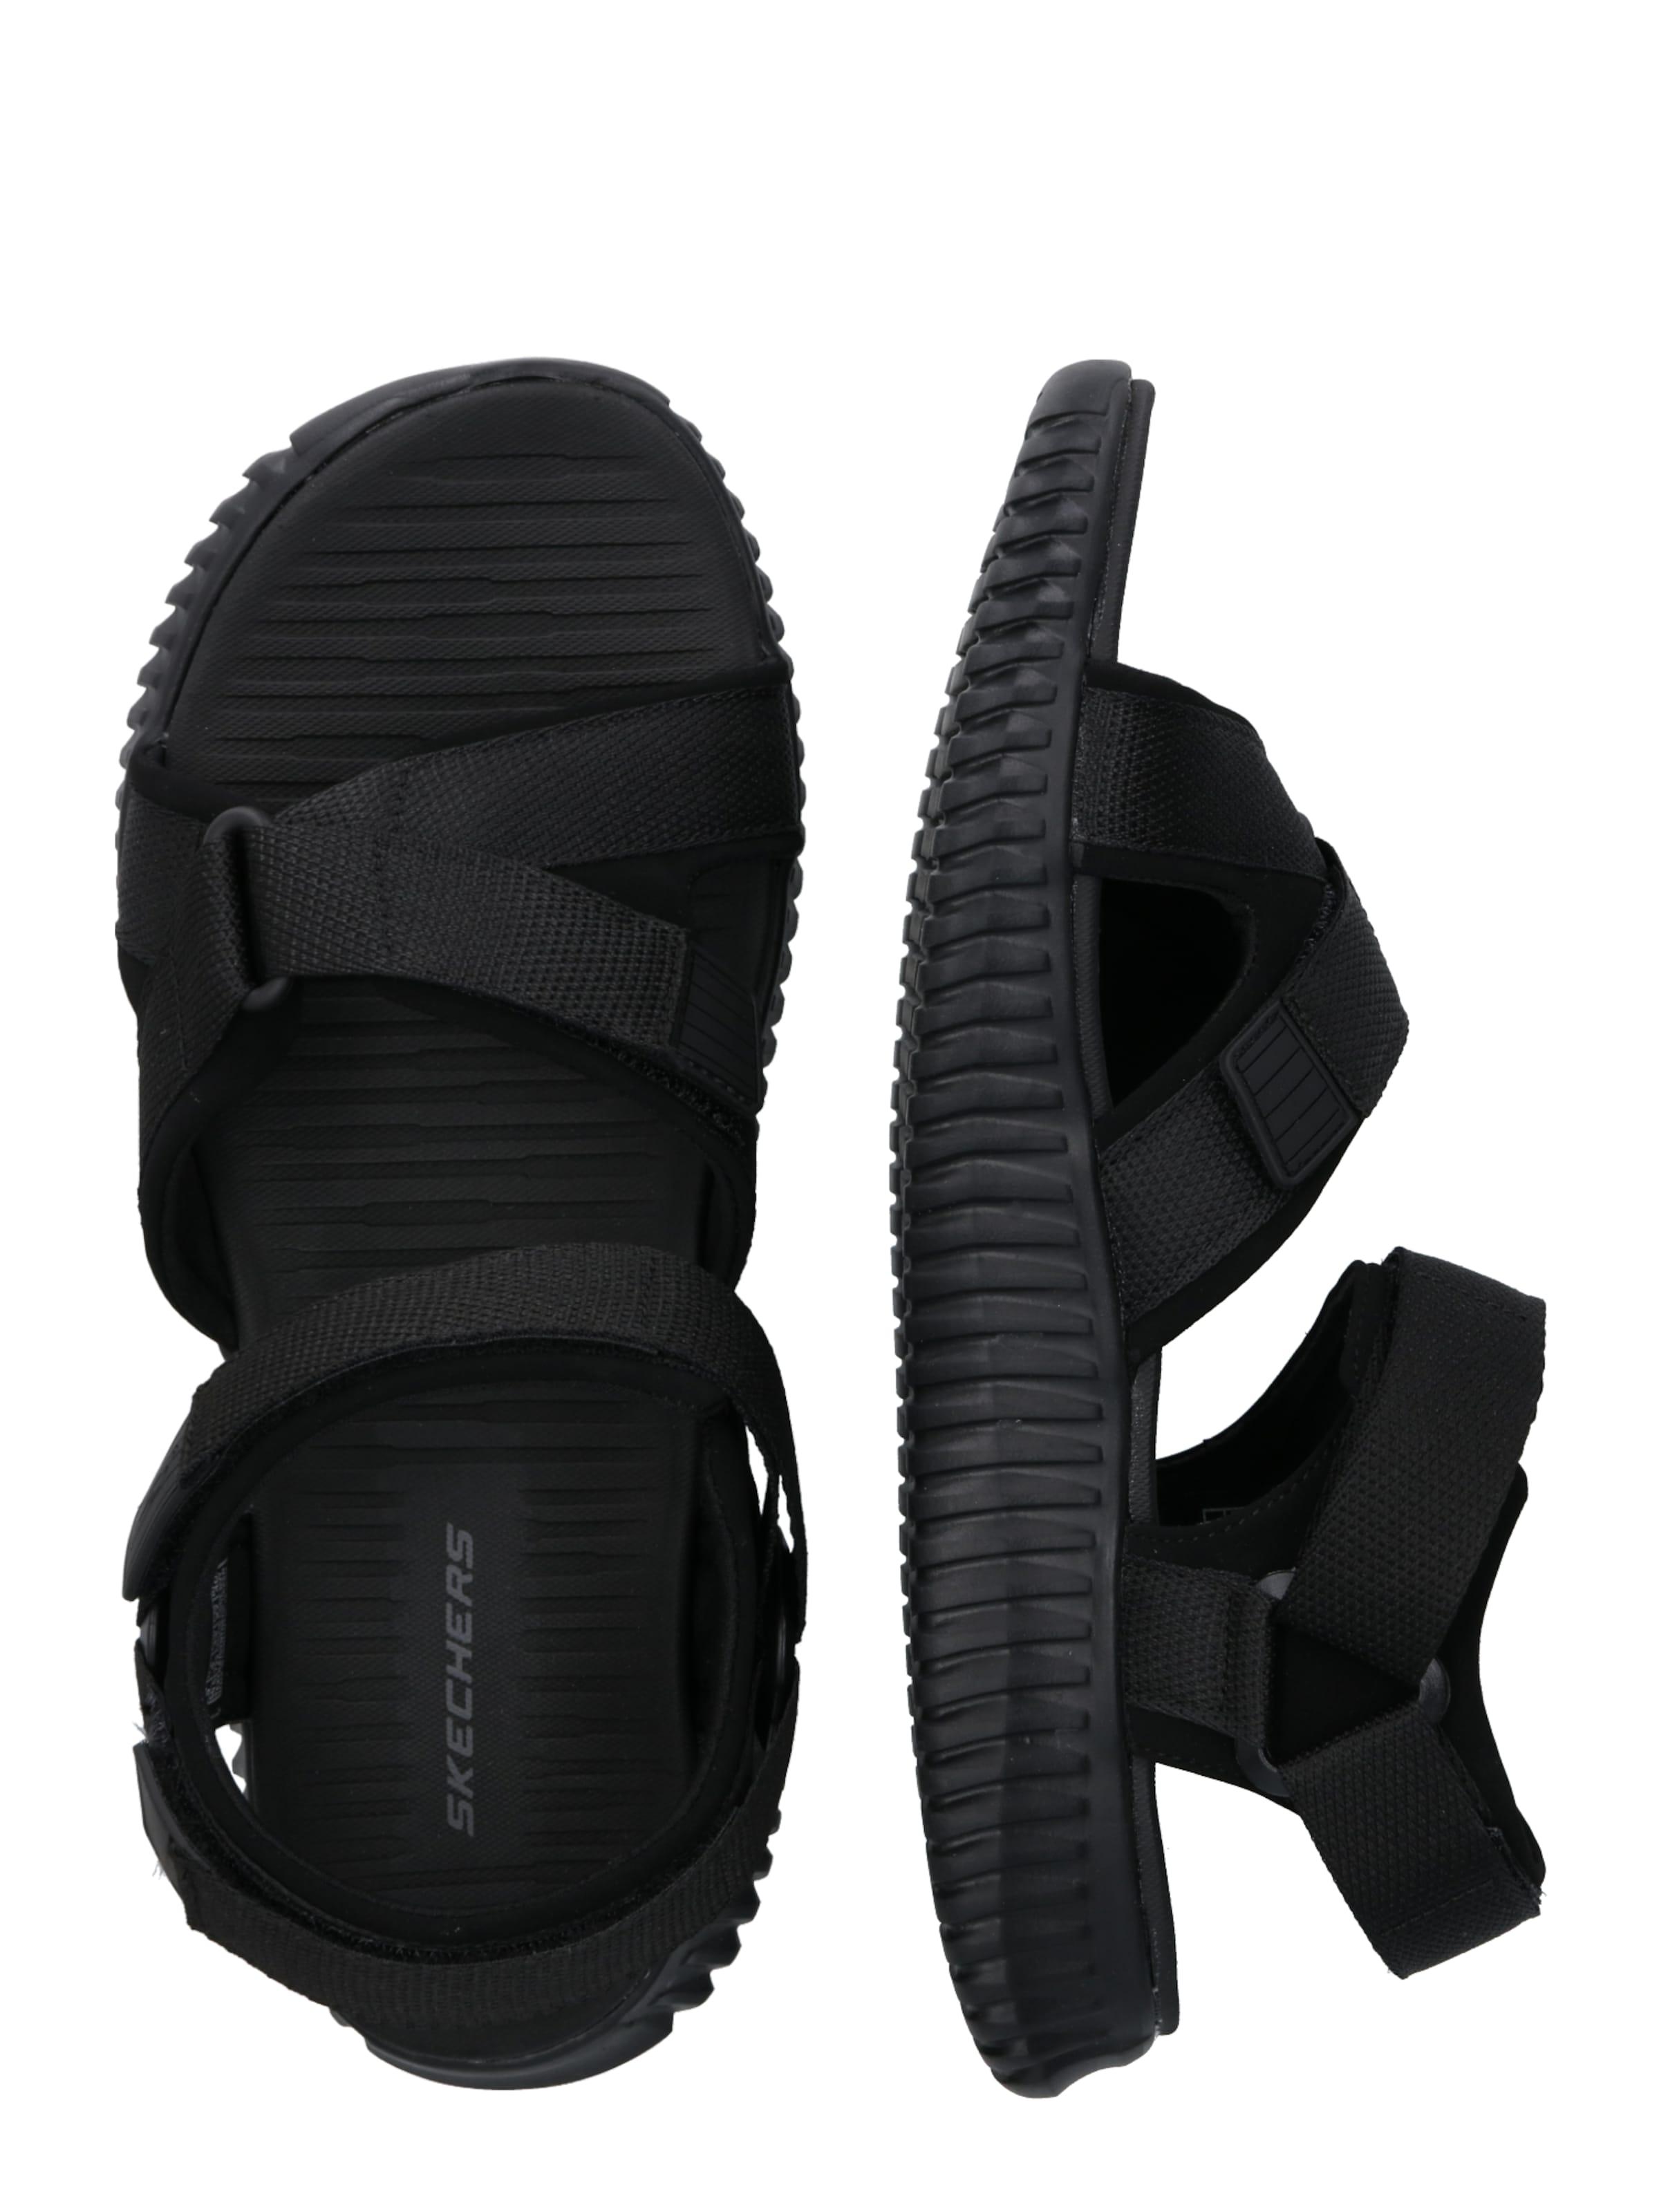 FlexLinston' 'elite Sandale In Schwarz Skechers wyv8ONnPm0